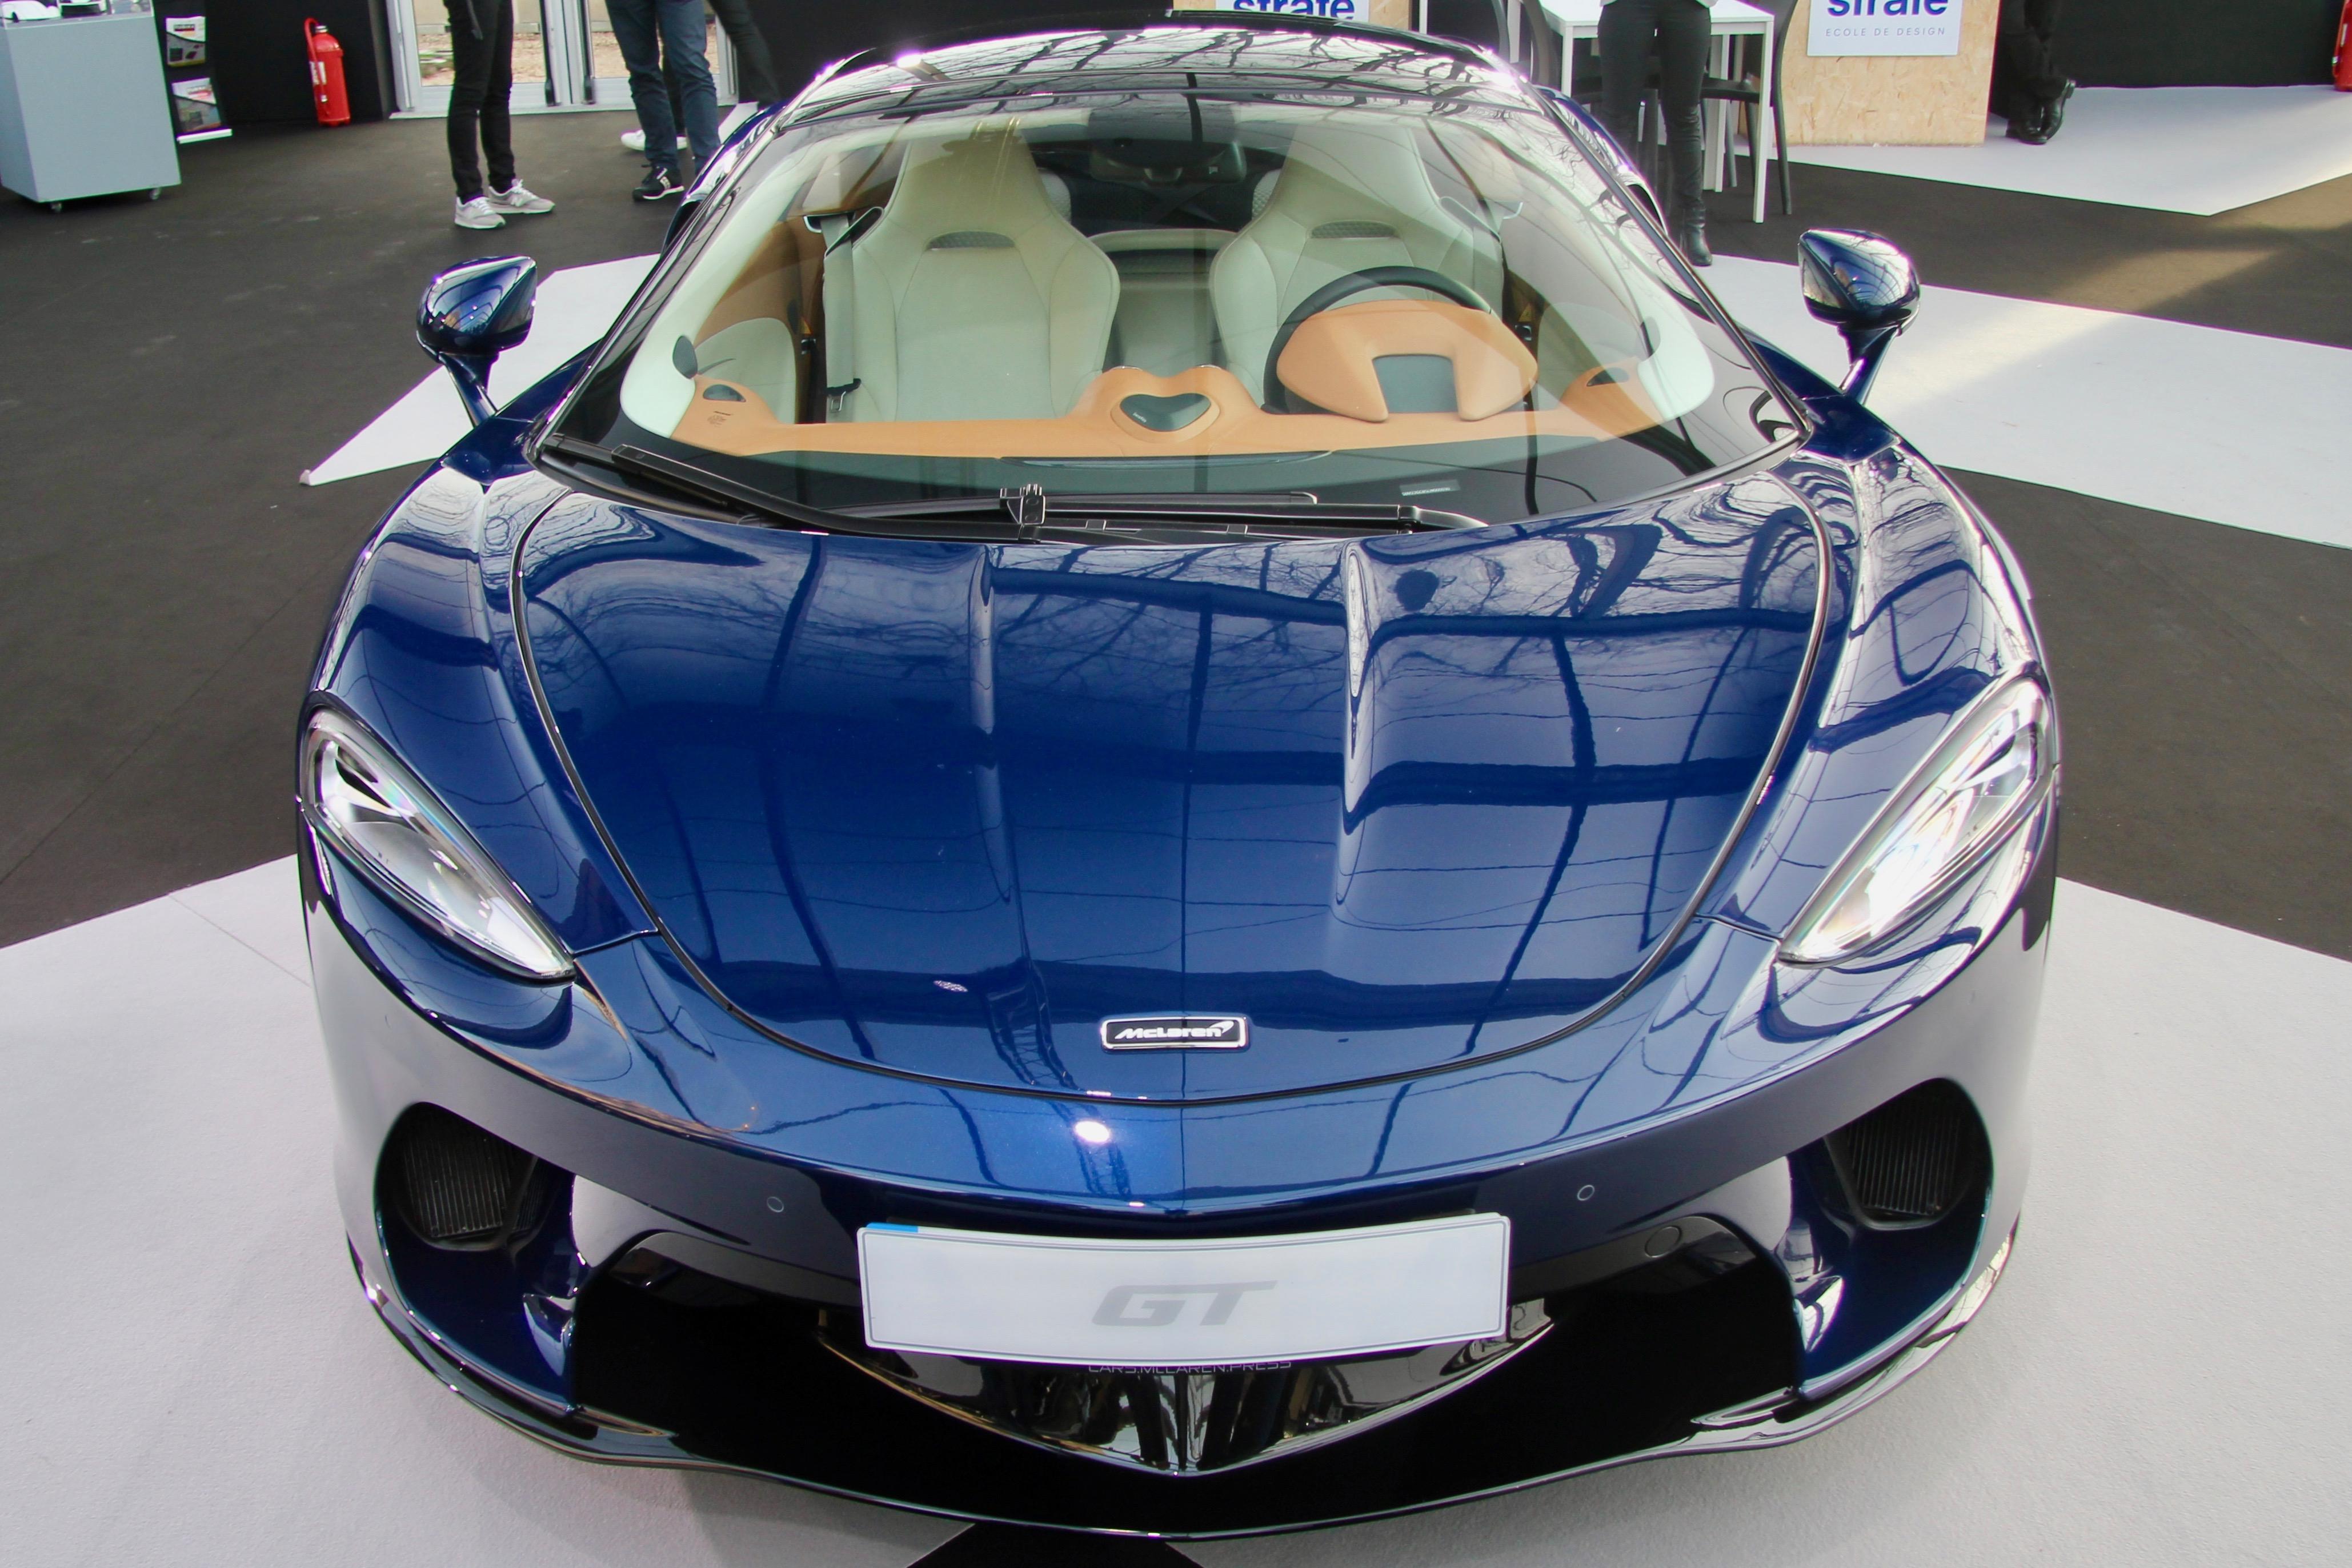 McLaren GT - front face / face avant - Festival Automobile International - 2020 - exposition Concept Cars - Design Automobile - photo Ludo Ferrari